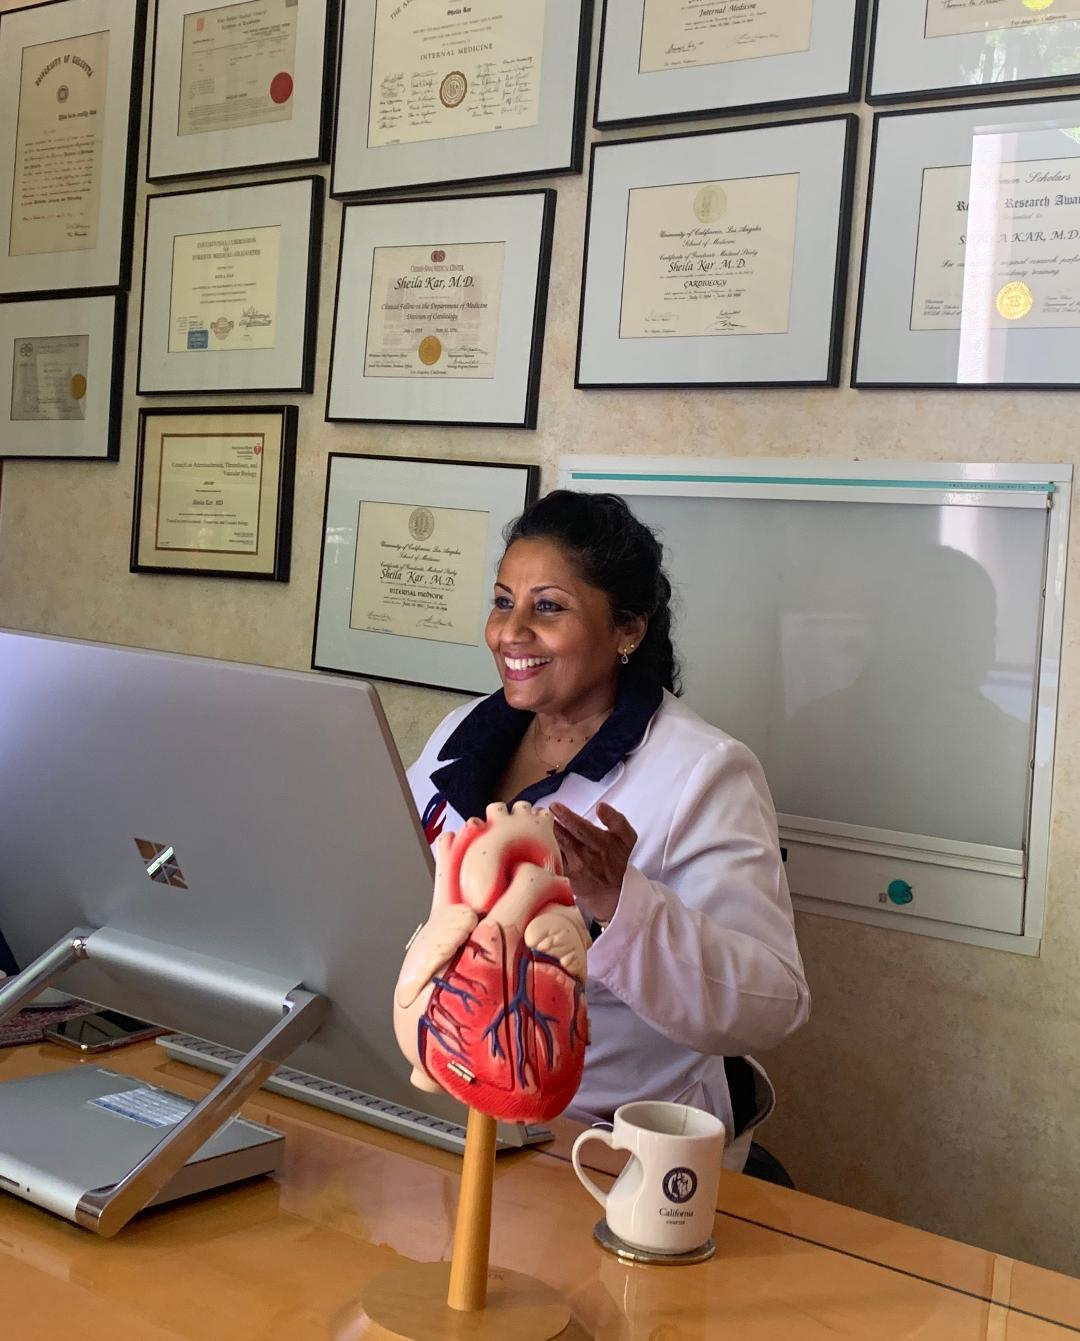 Dr. Sheila Kar looking on computer screen Photo